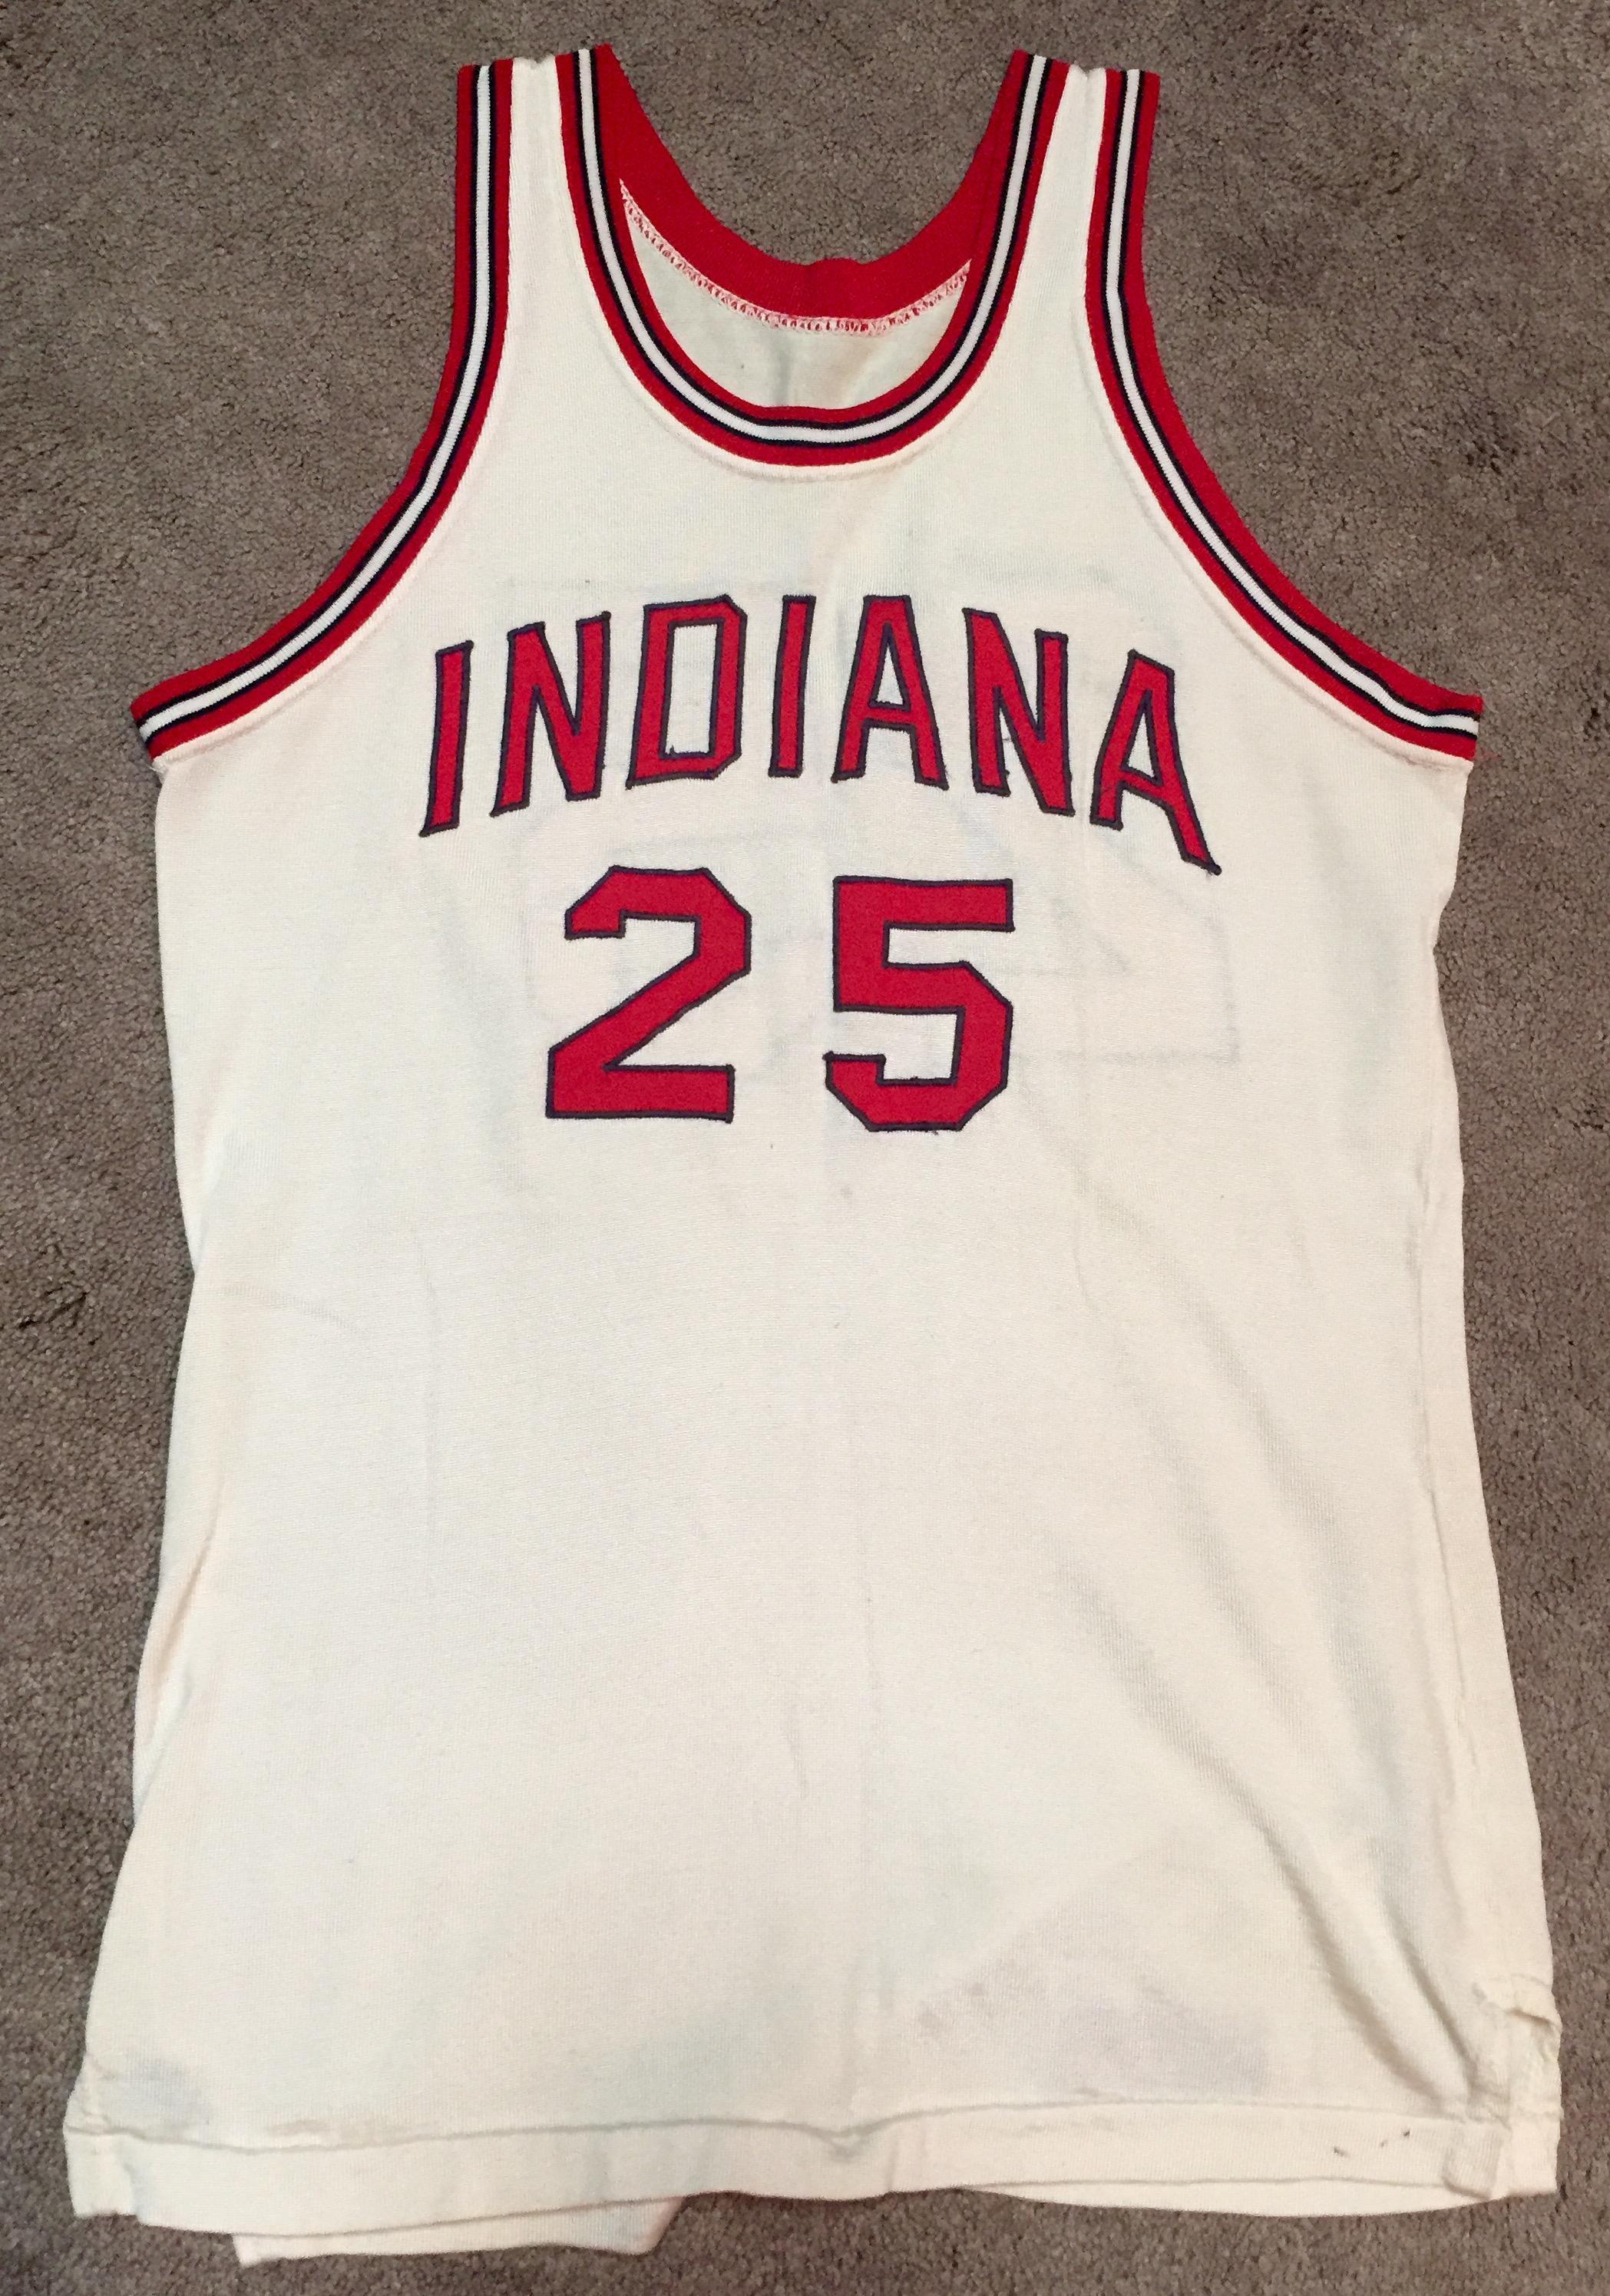 4b8db67bd00 A rare 1969-70 season Jeff Stocksdale IU home jersey. This jersey bears a